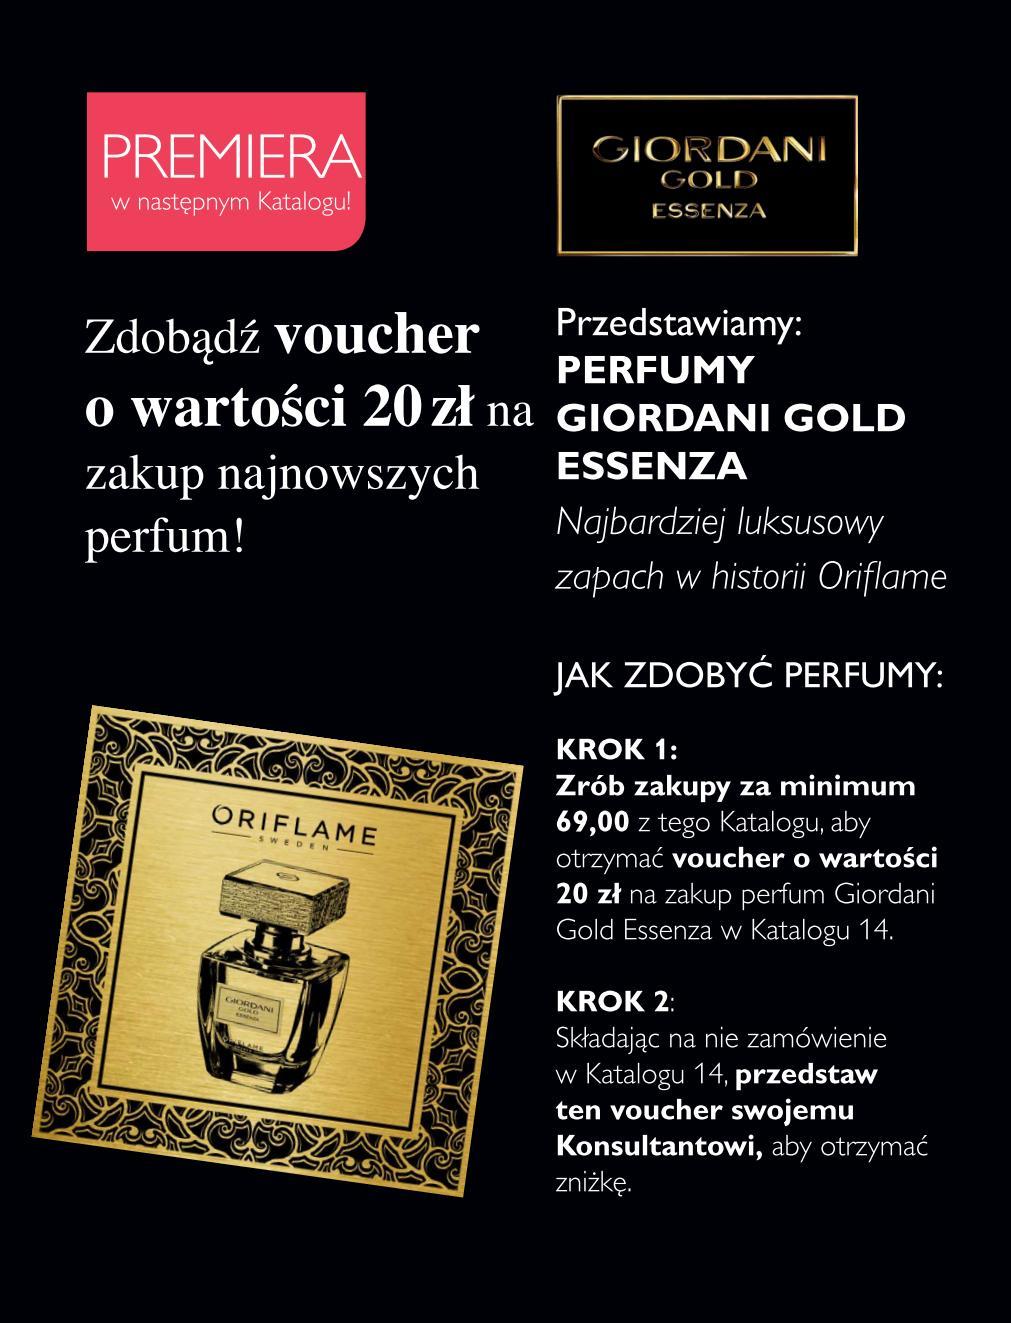 Katalog Oriflame 13 2015 perfumy